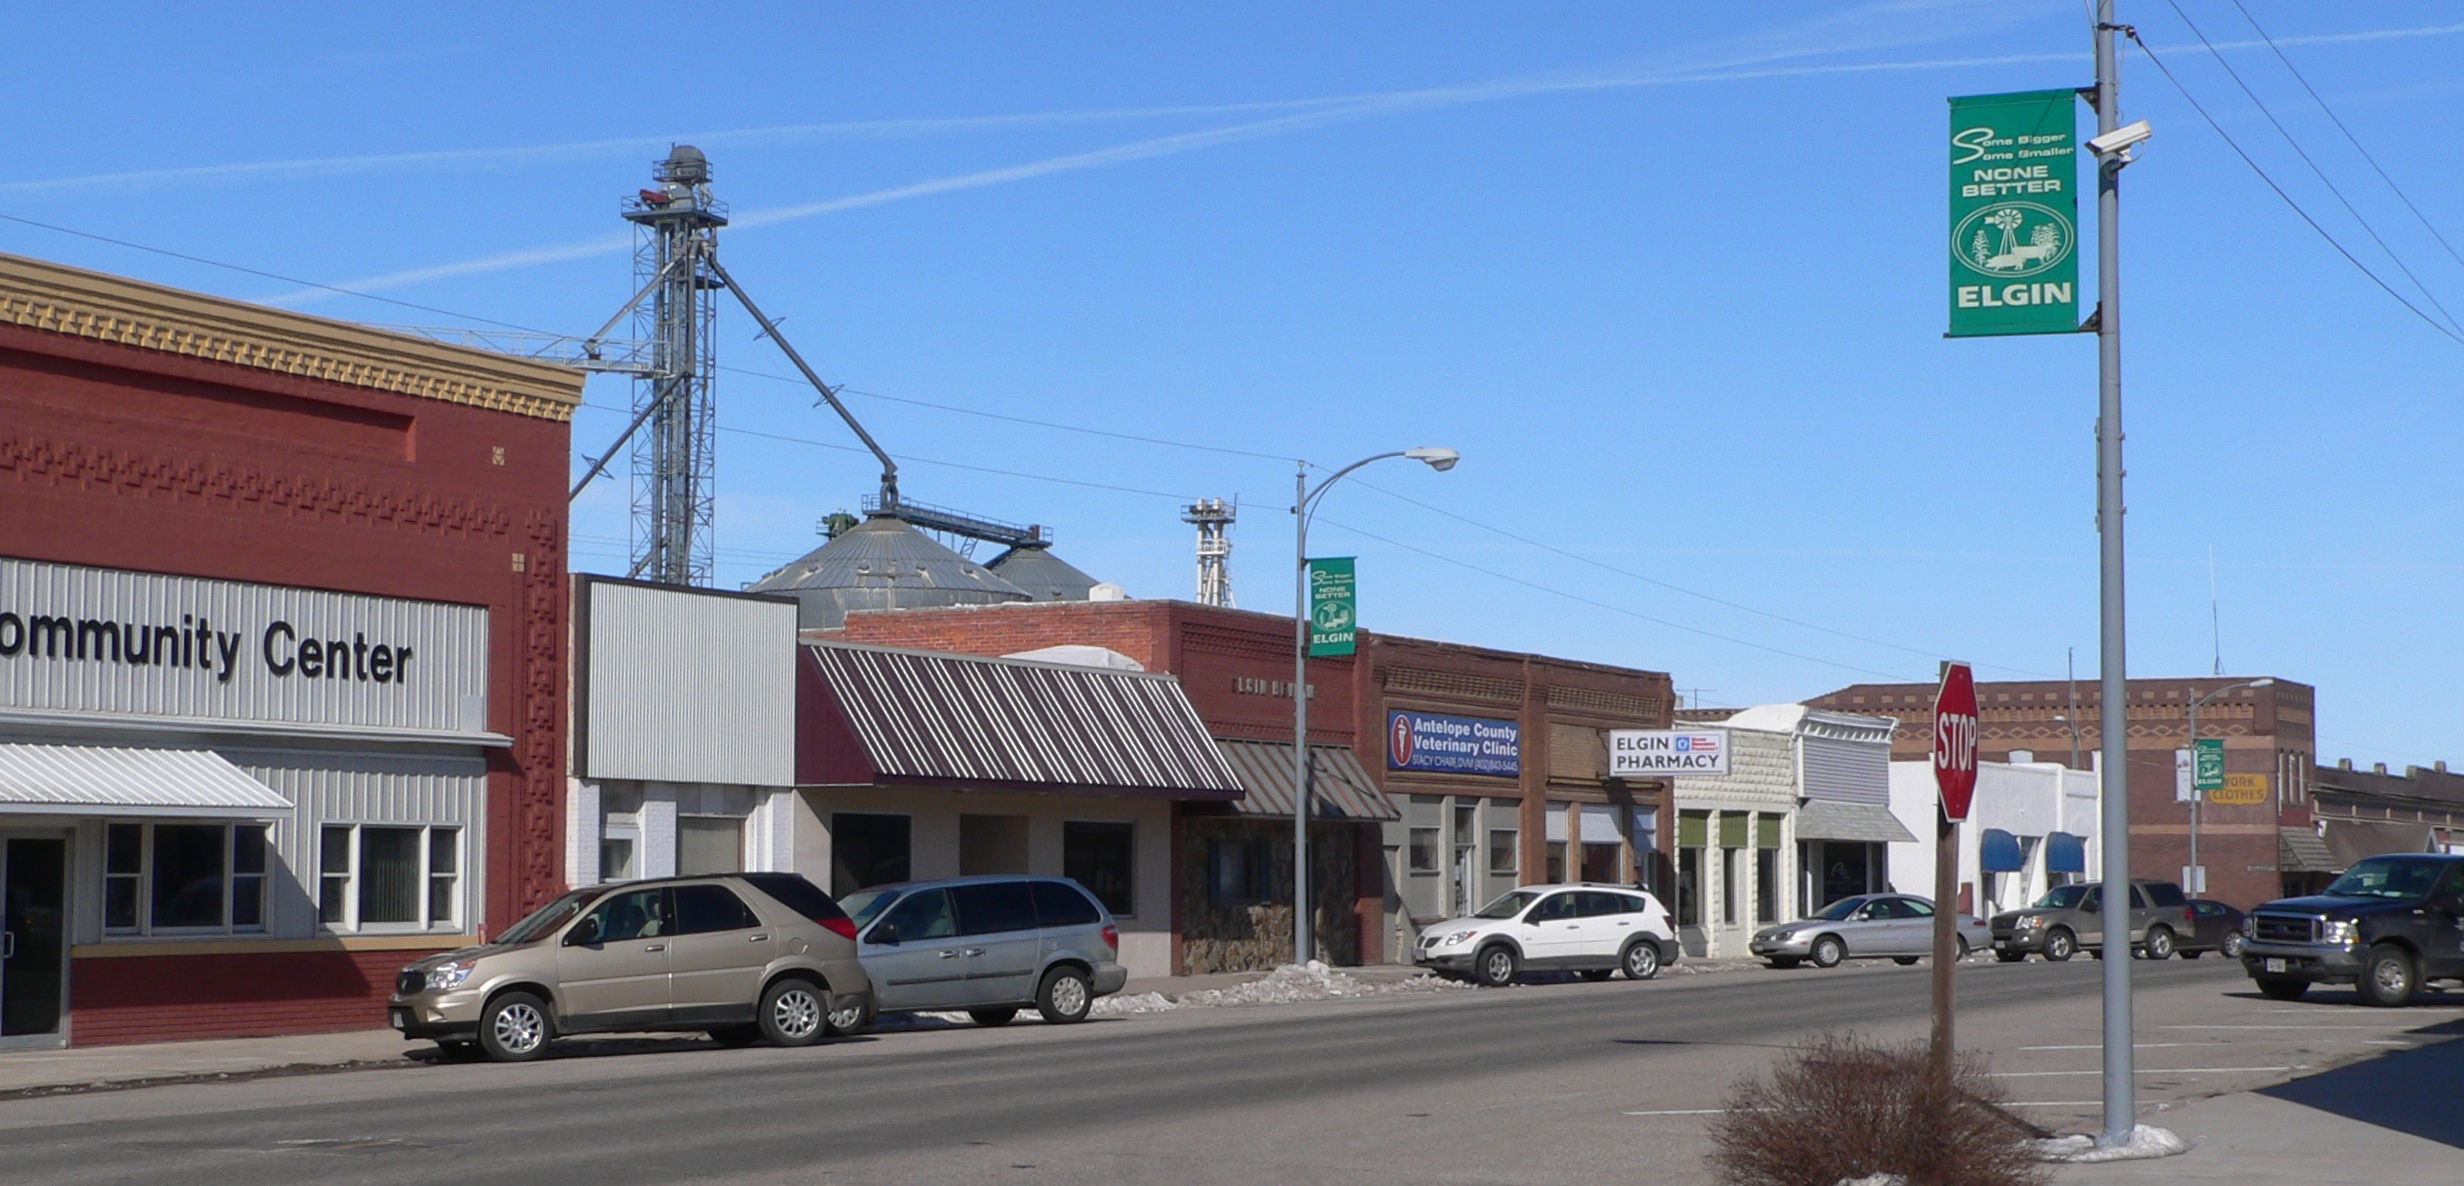 File:Elgin, Nebraska downtown 1.JPG - Wikipedia